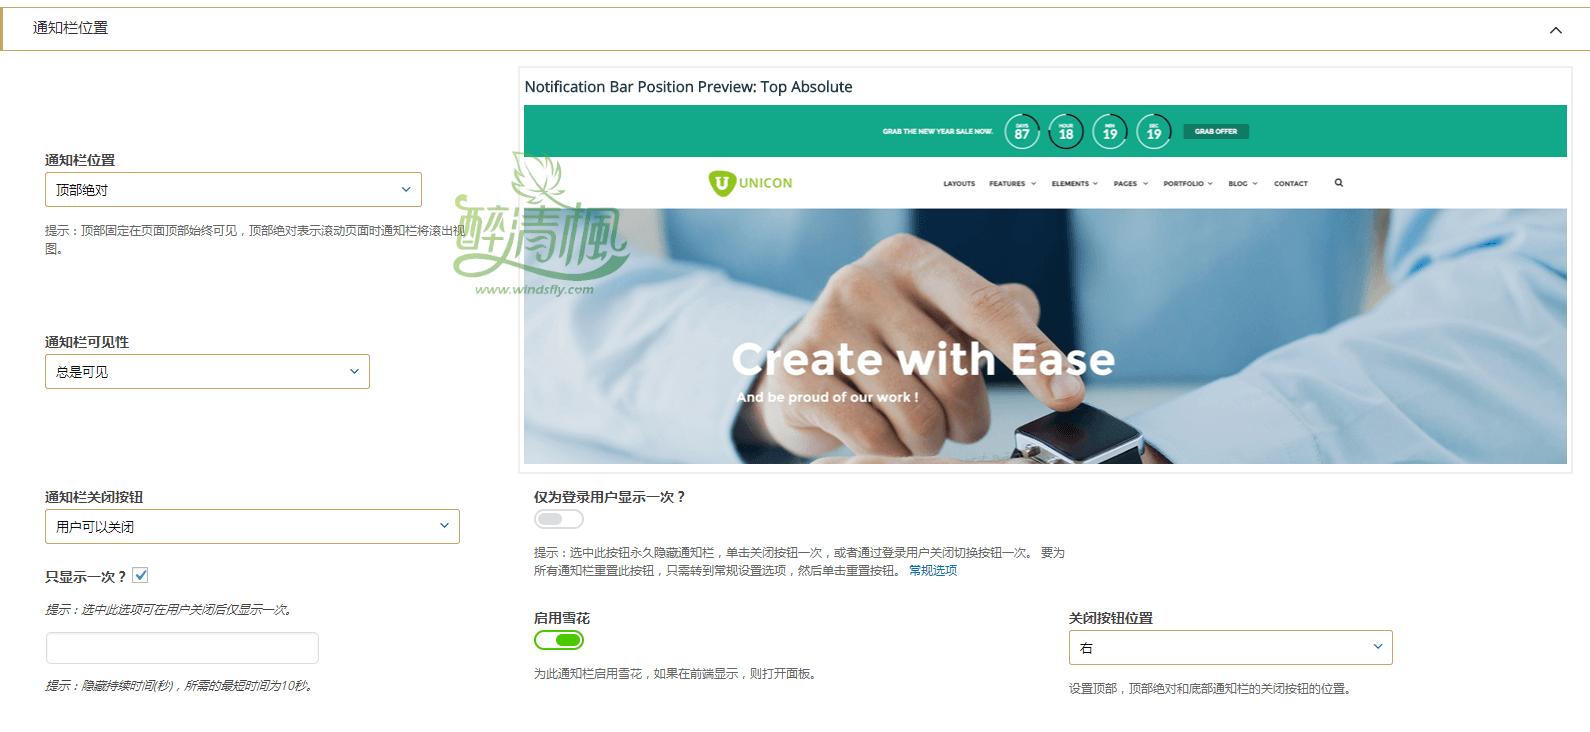 WordPress高级通知插件 - Apex Notification Bar(汉化)[更新至v2.1.4] WordPress插件 第5张